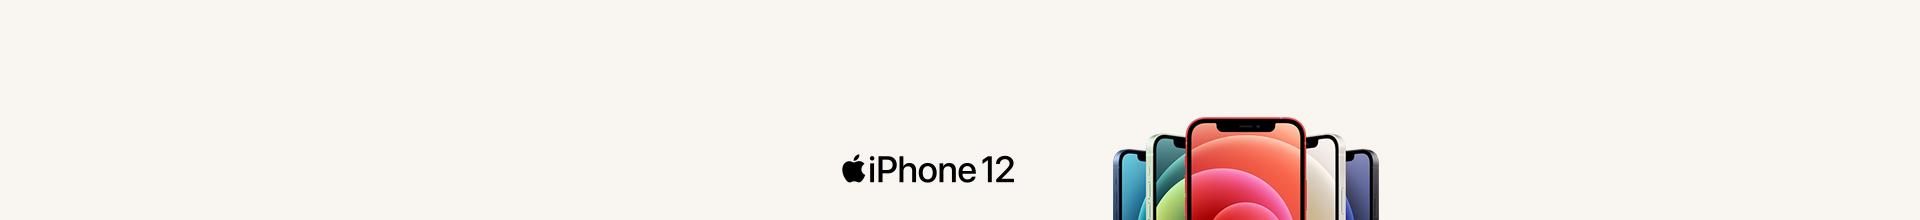 iPhone-Deals